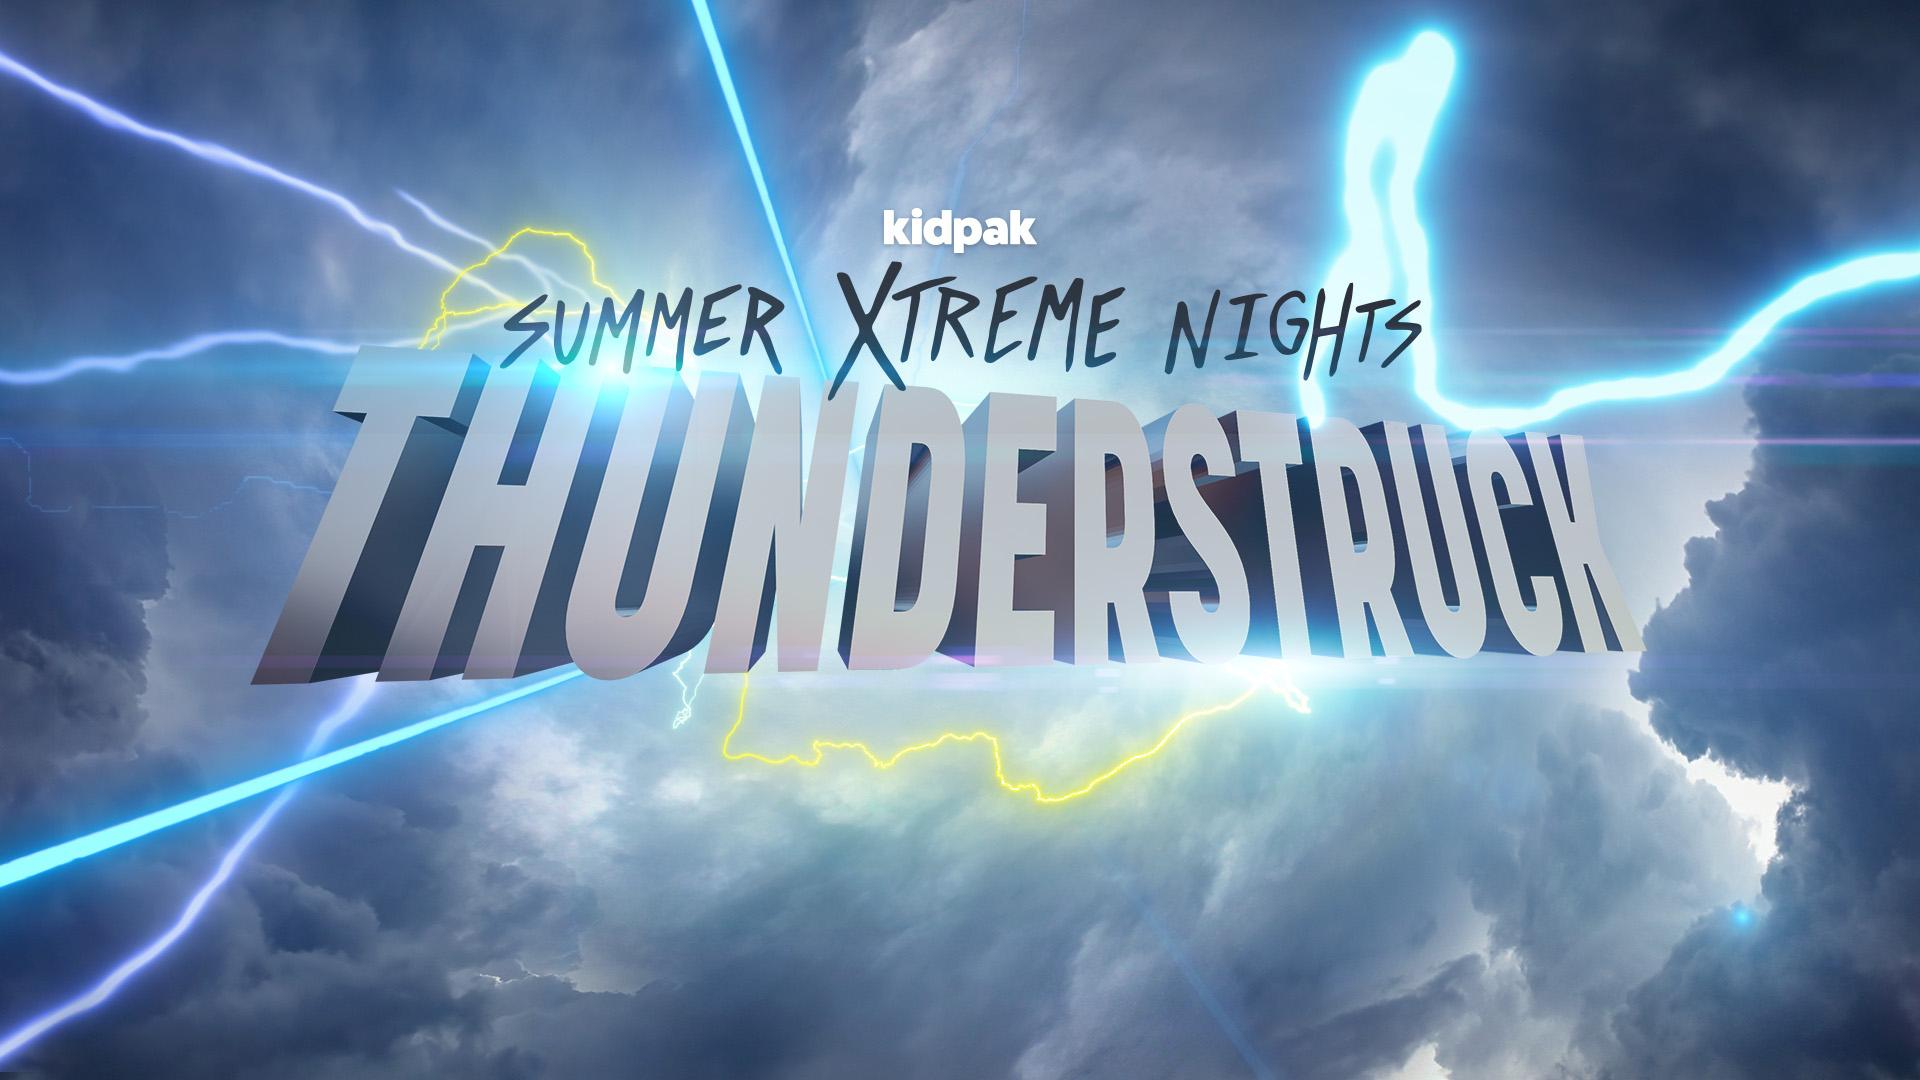 Summer Xtreme Nights Gainesville at the Gainesville campus